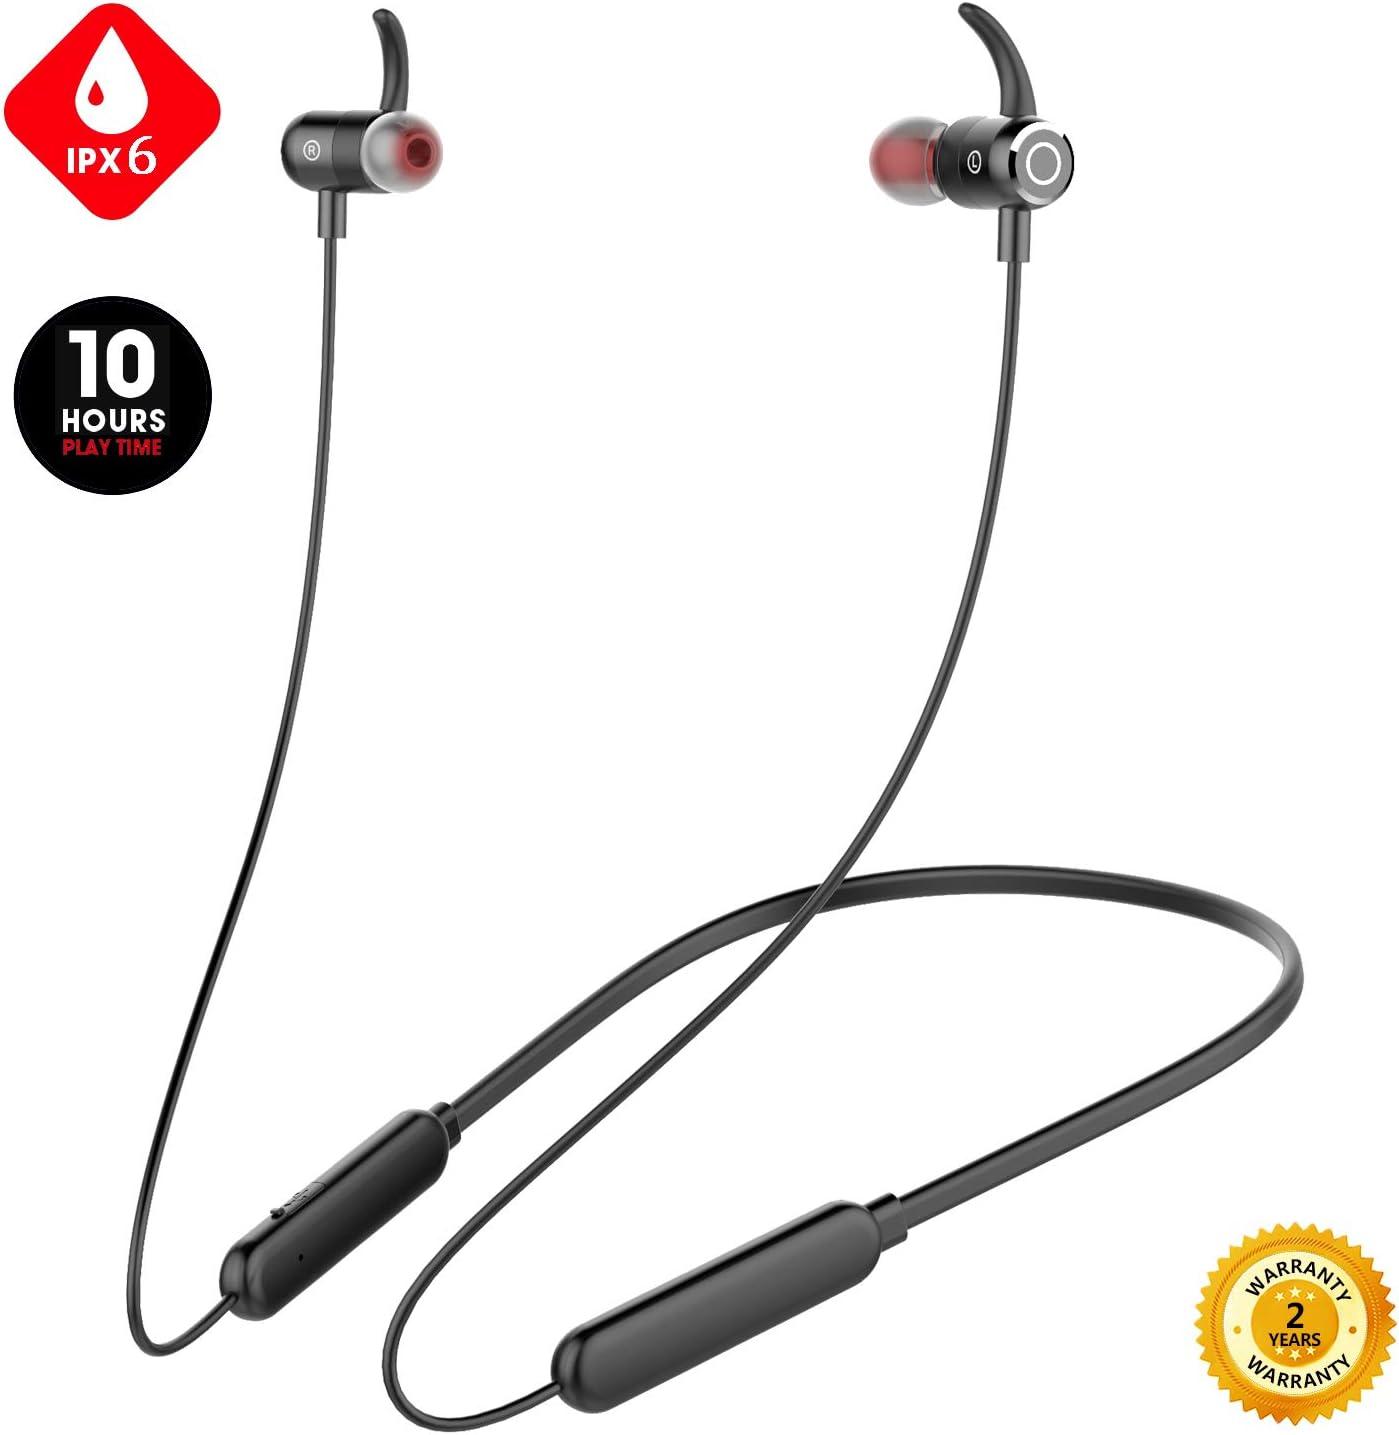 Junesh 2019 Newest Wireless Headphones, Premium 10hrs Bluetooth Earphones, Neckband Headphones with Mic,IPX6 Waterproof Wireless Earbuds Sport,HiFi Bass Magnetic Earbuds for Running Workout Gym